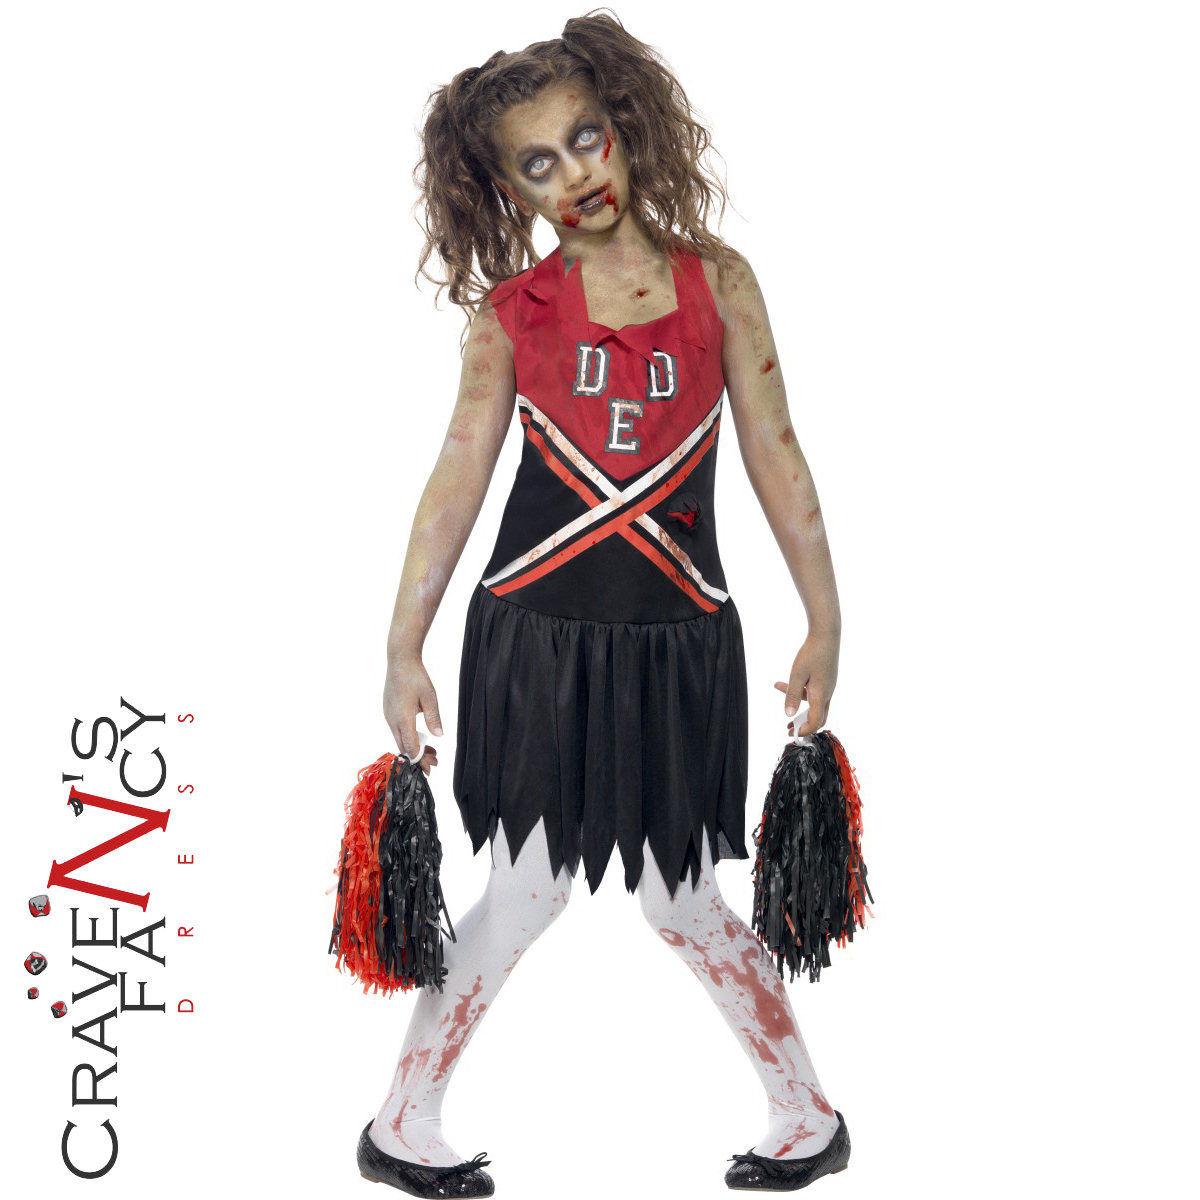 3a0321ff3603 Girls Zombie Cheerleader School Girl Costume Halloween Kids Fancy Dress  Outfit Sc 1 St EBay